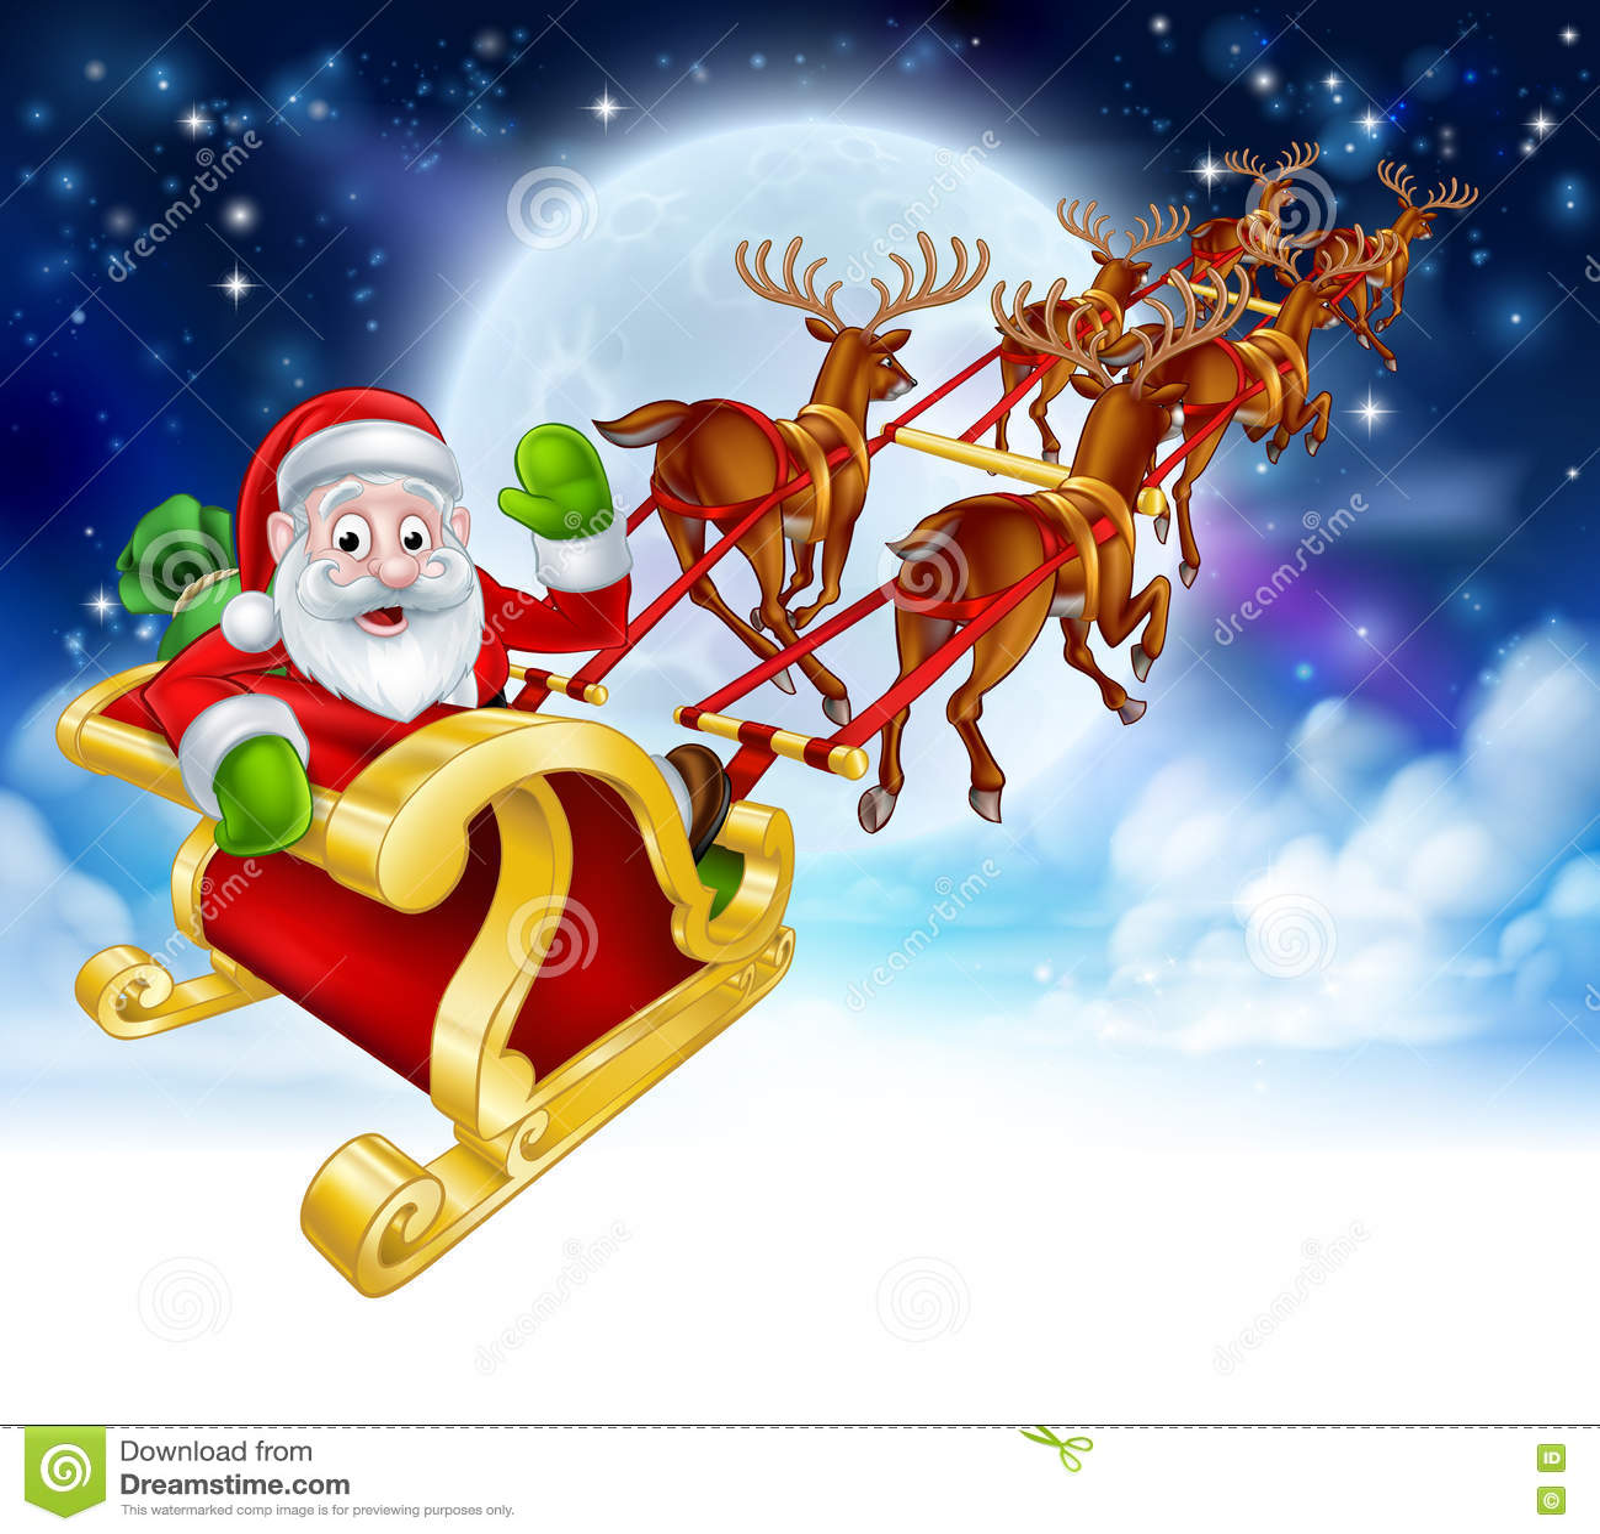 Santa Reindeer Sleigh Cartoon Christmas-Szene Vektor Abbildung ...